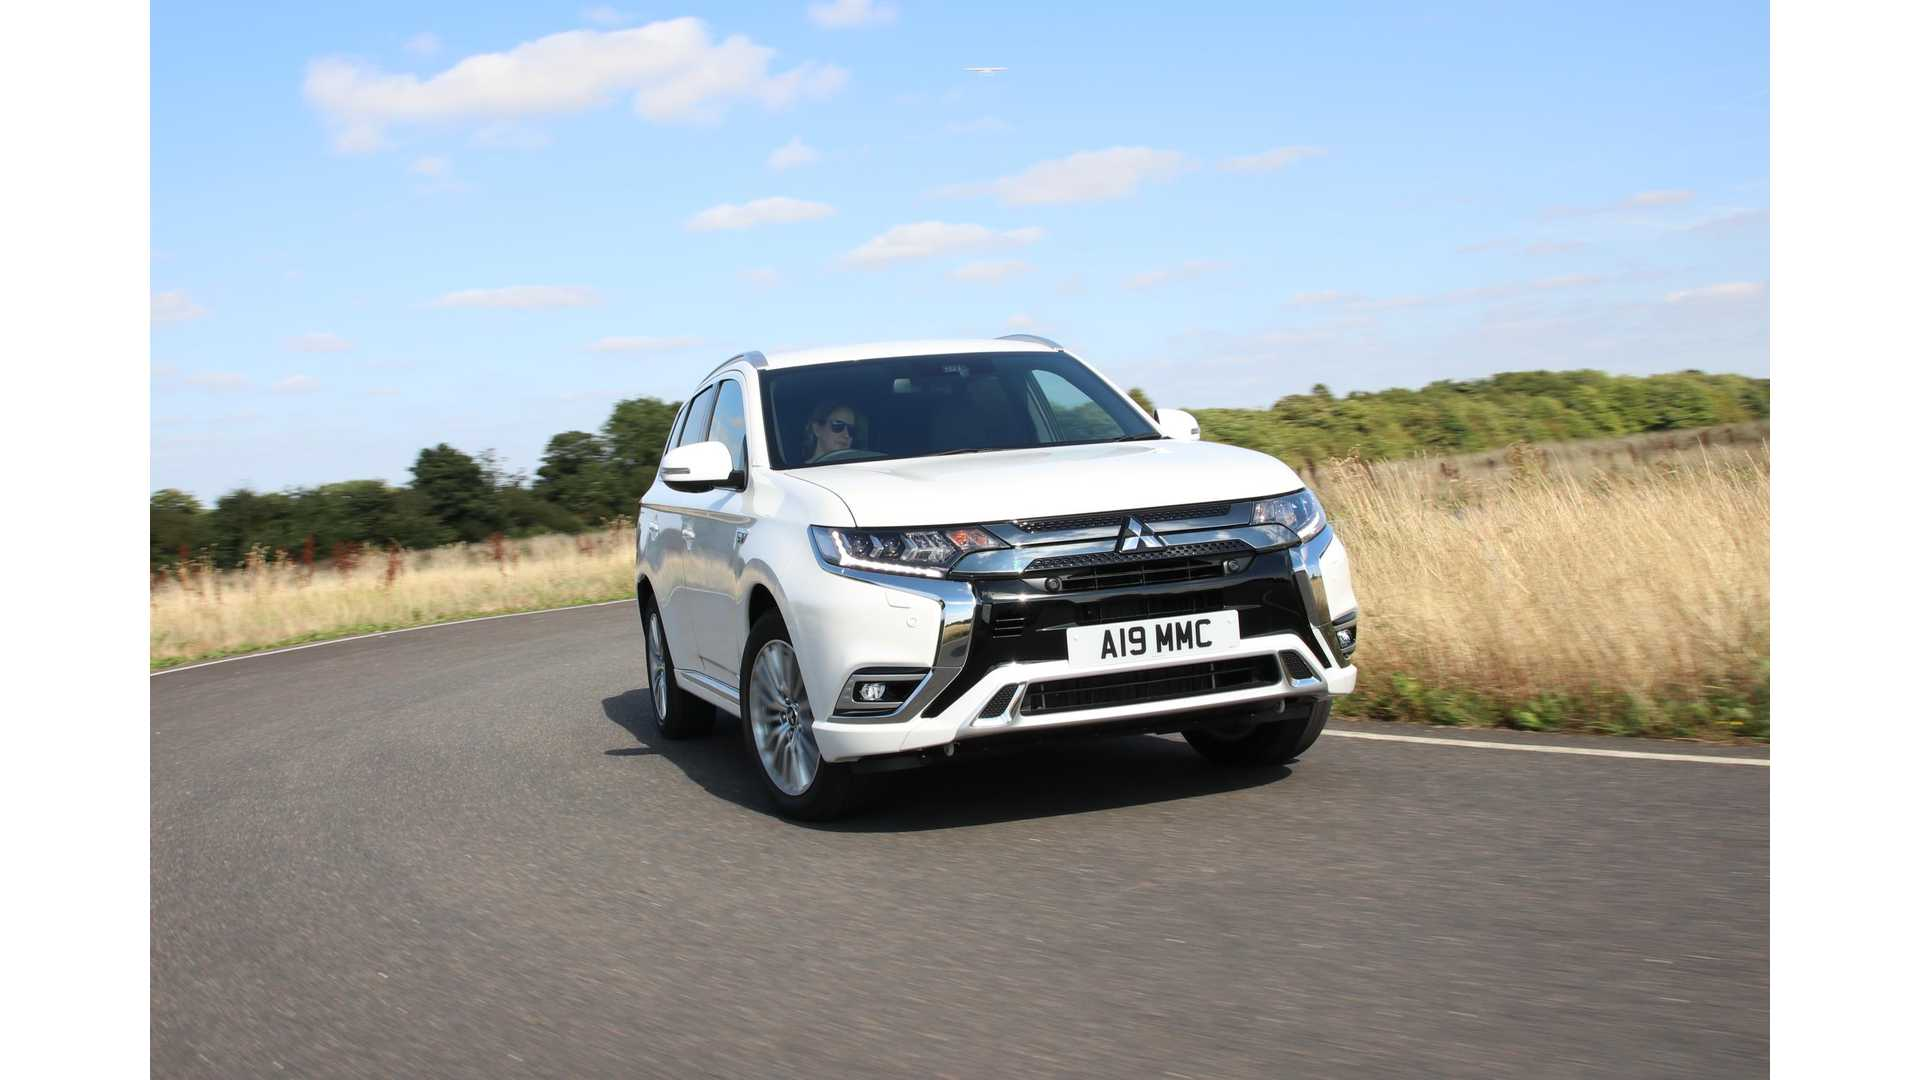 Carwow Reviews The 2019 Mitsubishi Outlander PHEV: Video